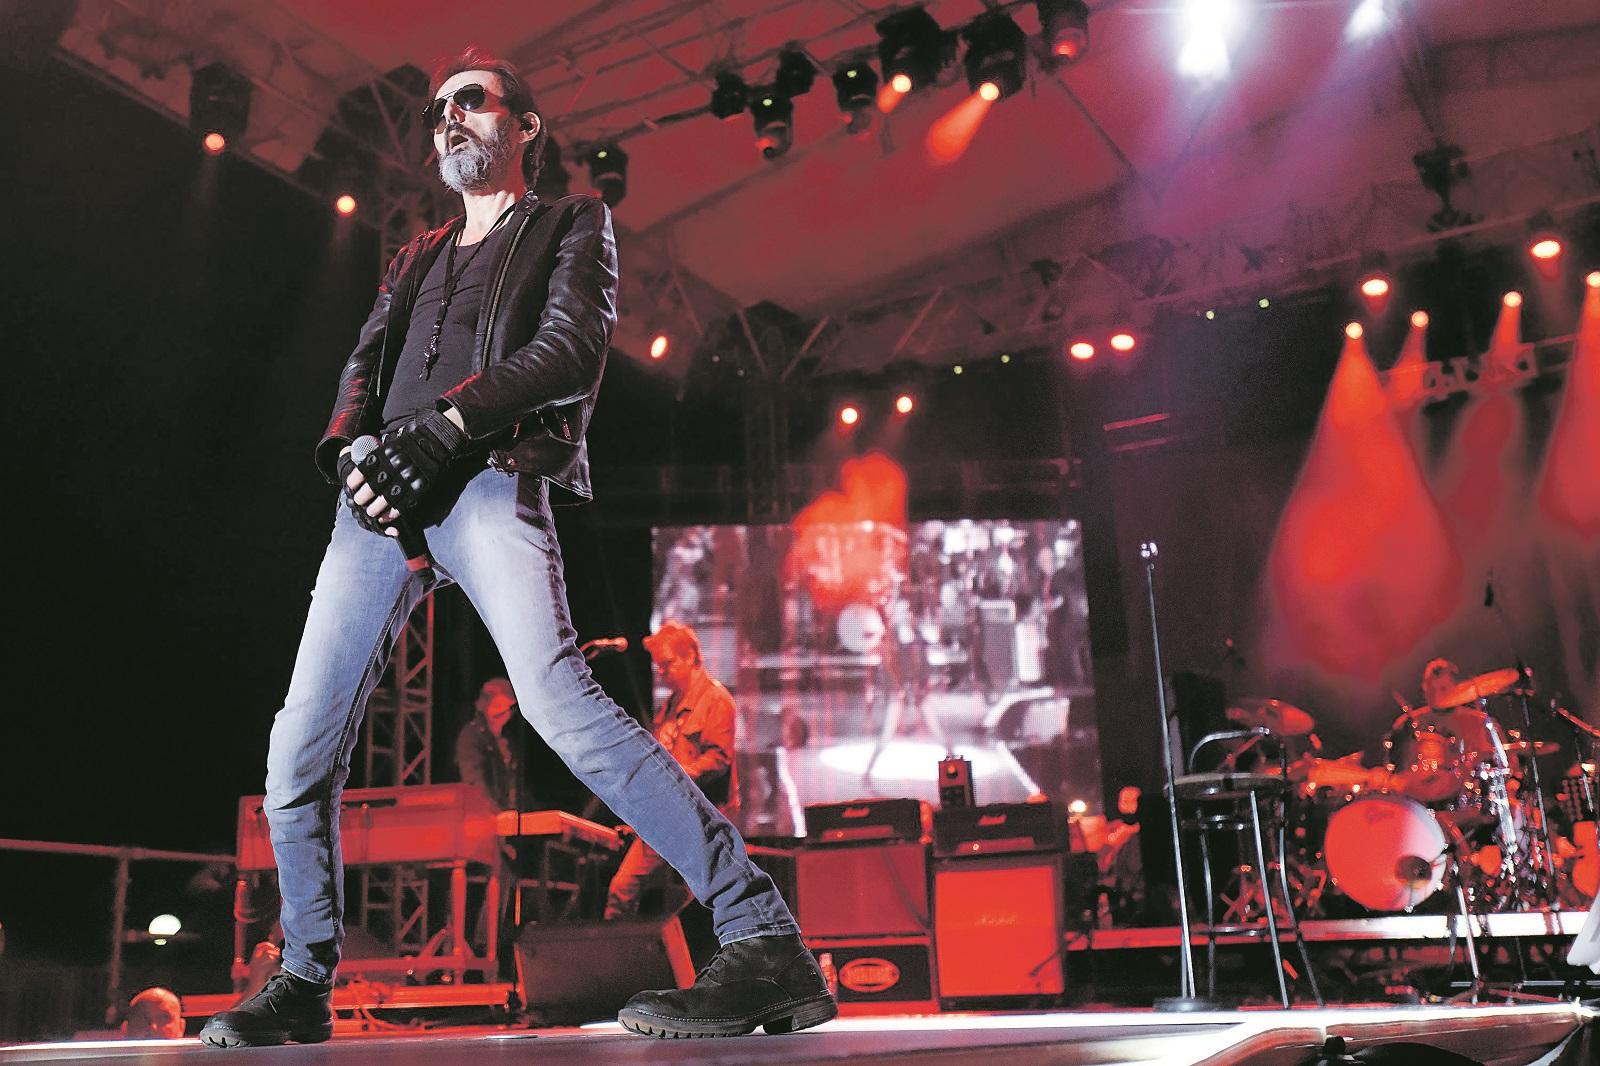 Zagreb, 010619. Goran Bare koncertom na zagrebackoj Salati slavi 30 godina rokerske karijere. Foto: Darko Tomas / CROPIX